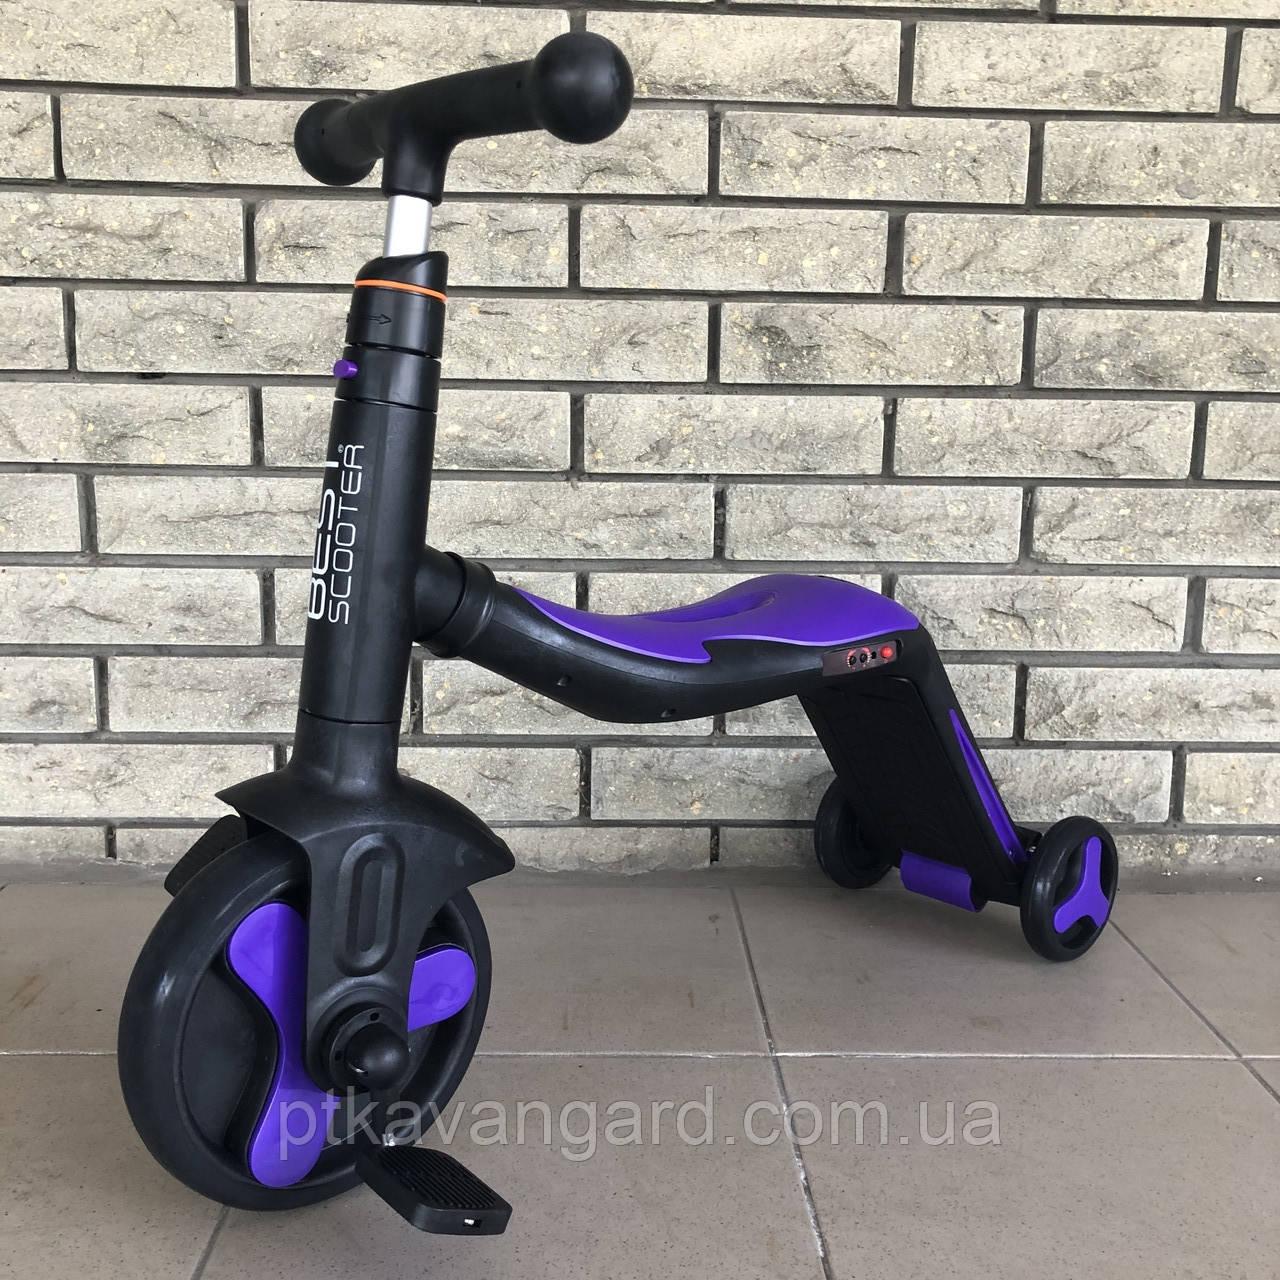 Велосамокат 3 в 1 Самокат Беговел Фіолетовий музичний Best Scooter JT 30304